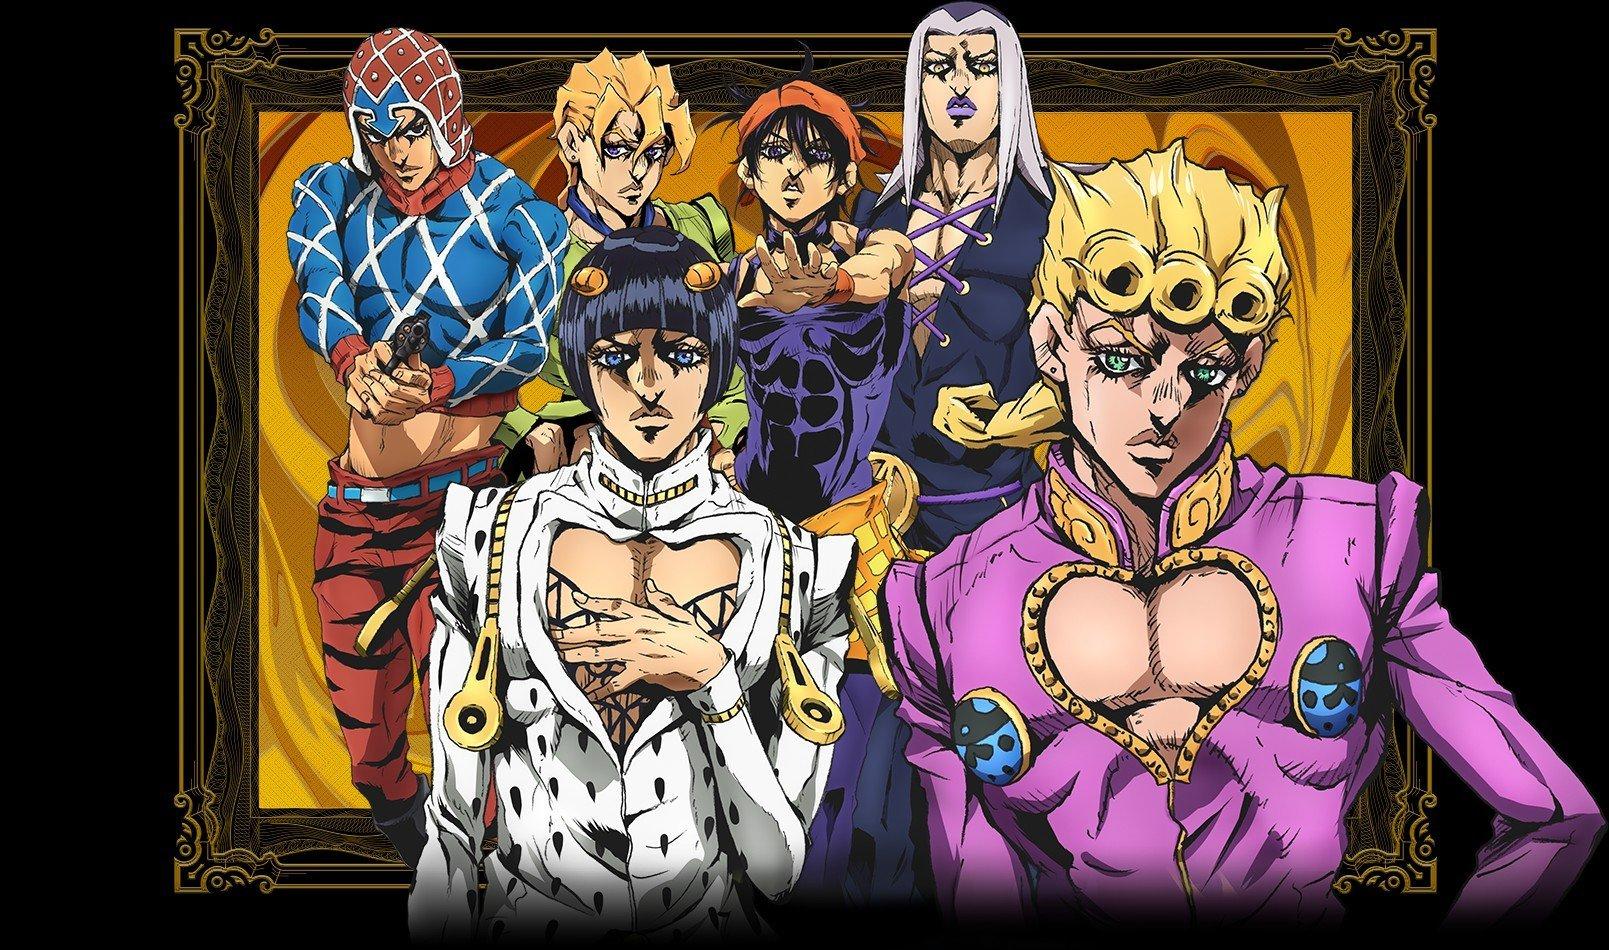 Jojos Bizarre Adventure Part 5Vento Aureo Receives Anime